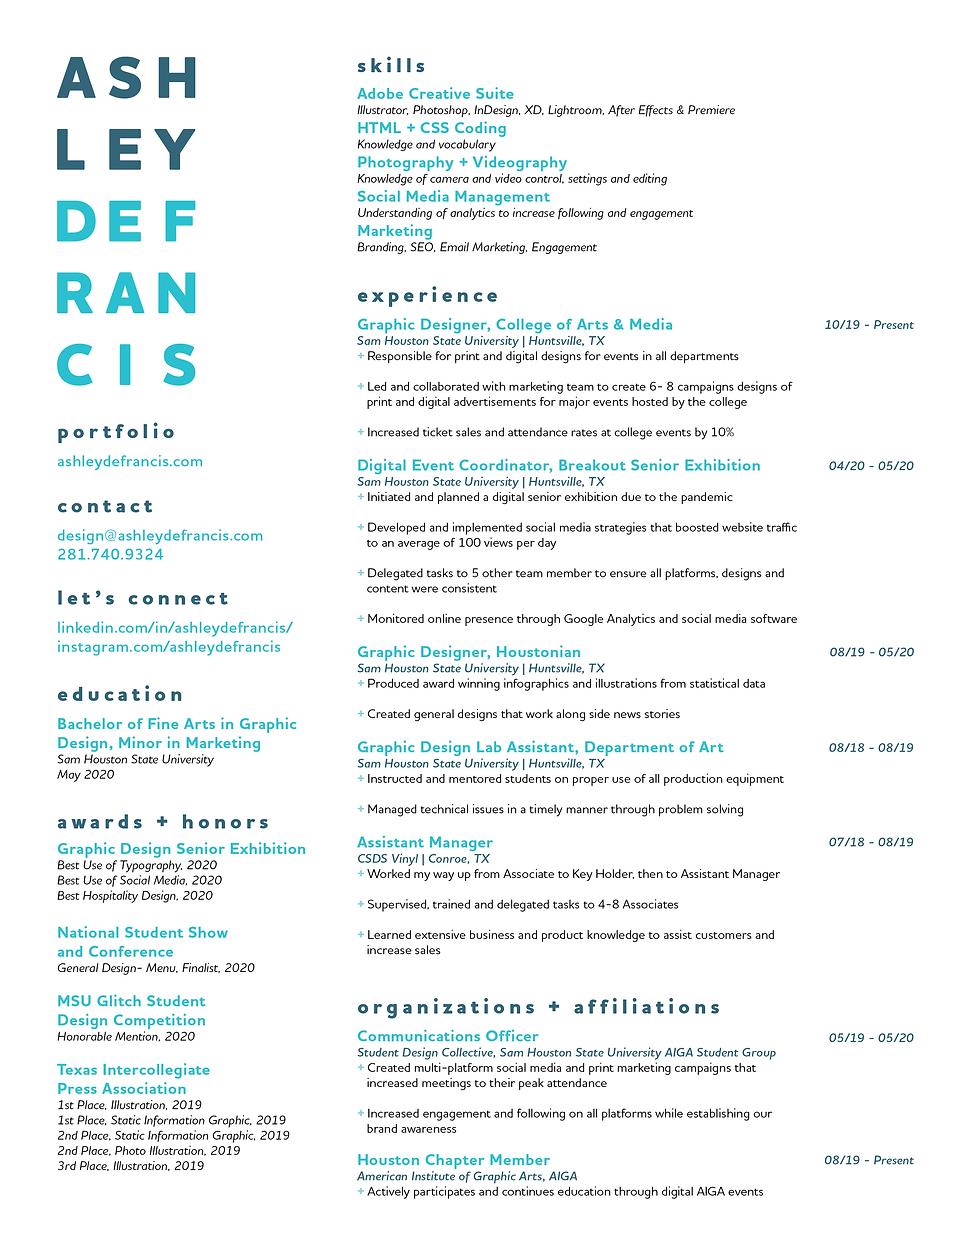 Ashley Defrancis Graphic Design Resume